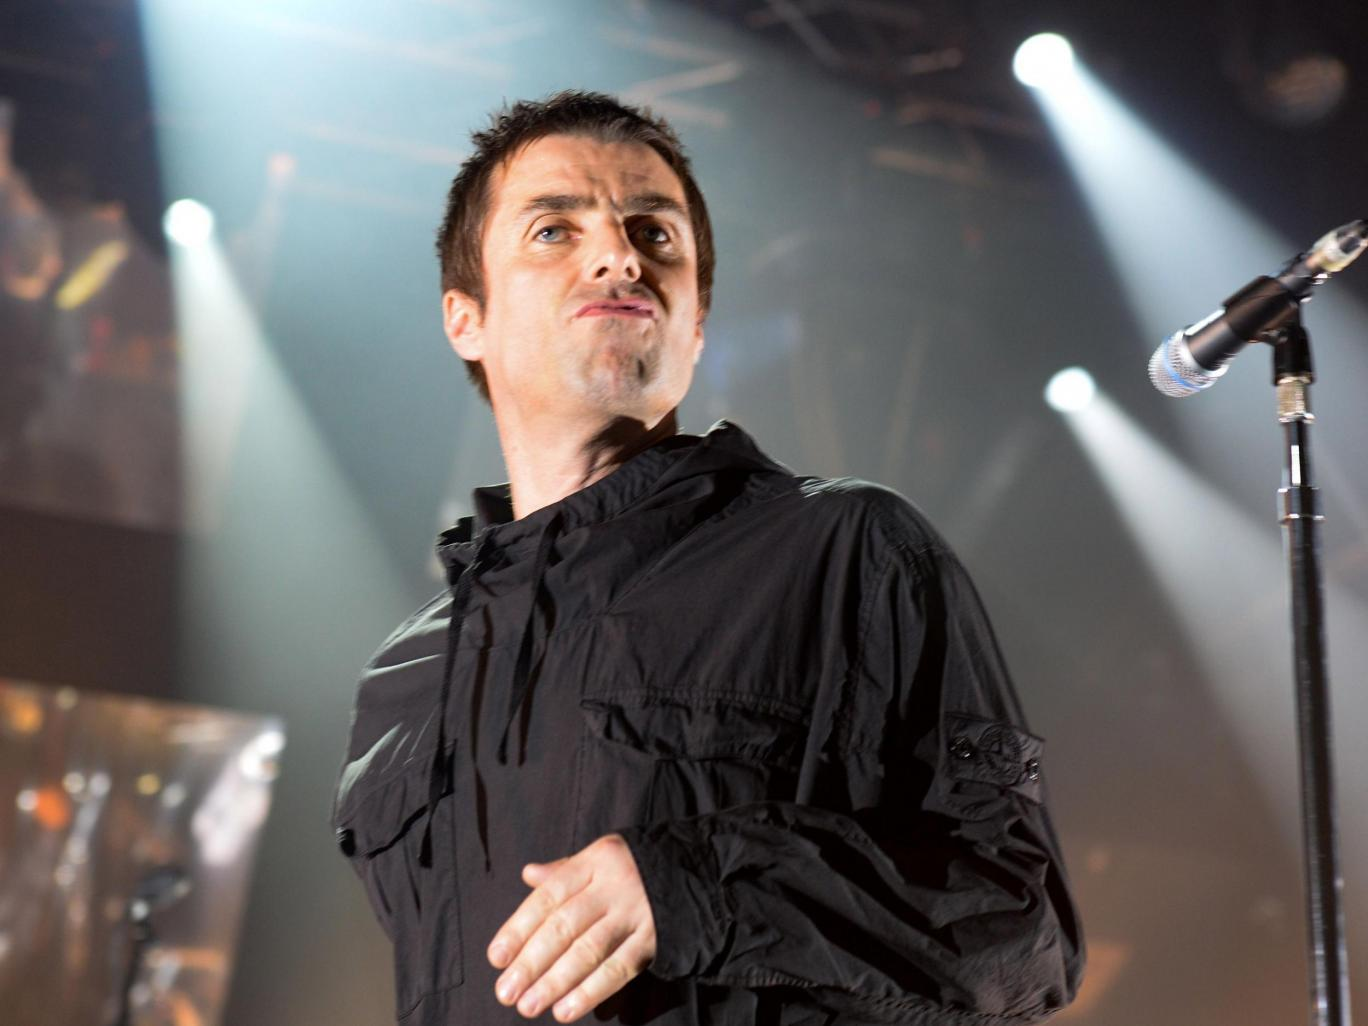 Liam Gallagher in concert at Electric Brixton, London, UK - 1 Jun 2017 PJP photos/REX/Shutterstock